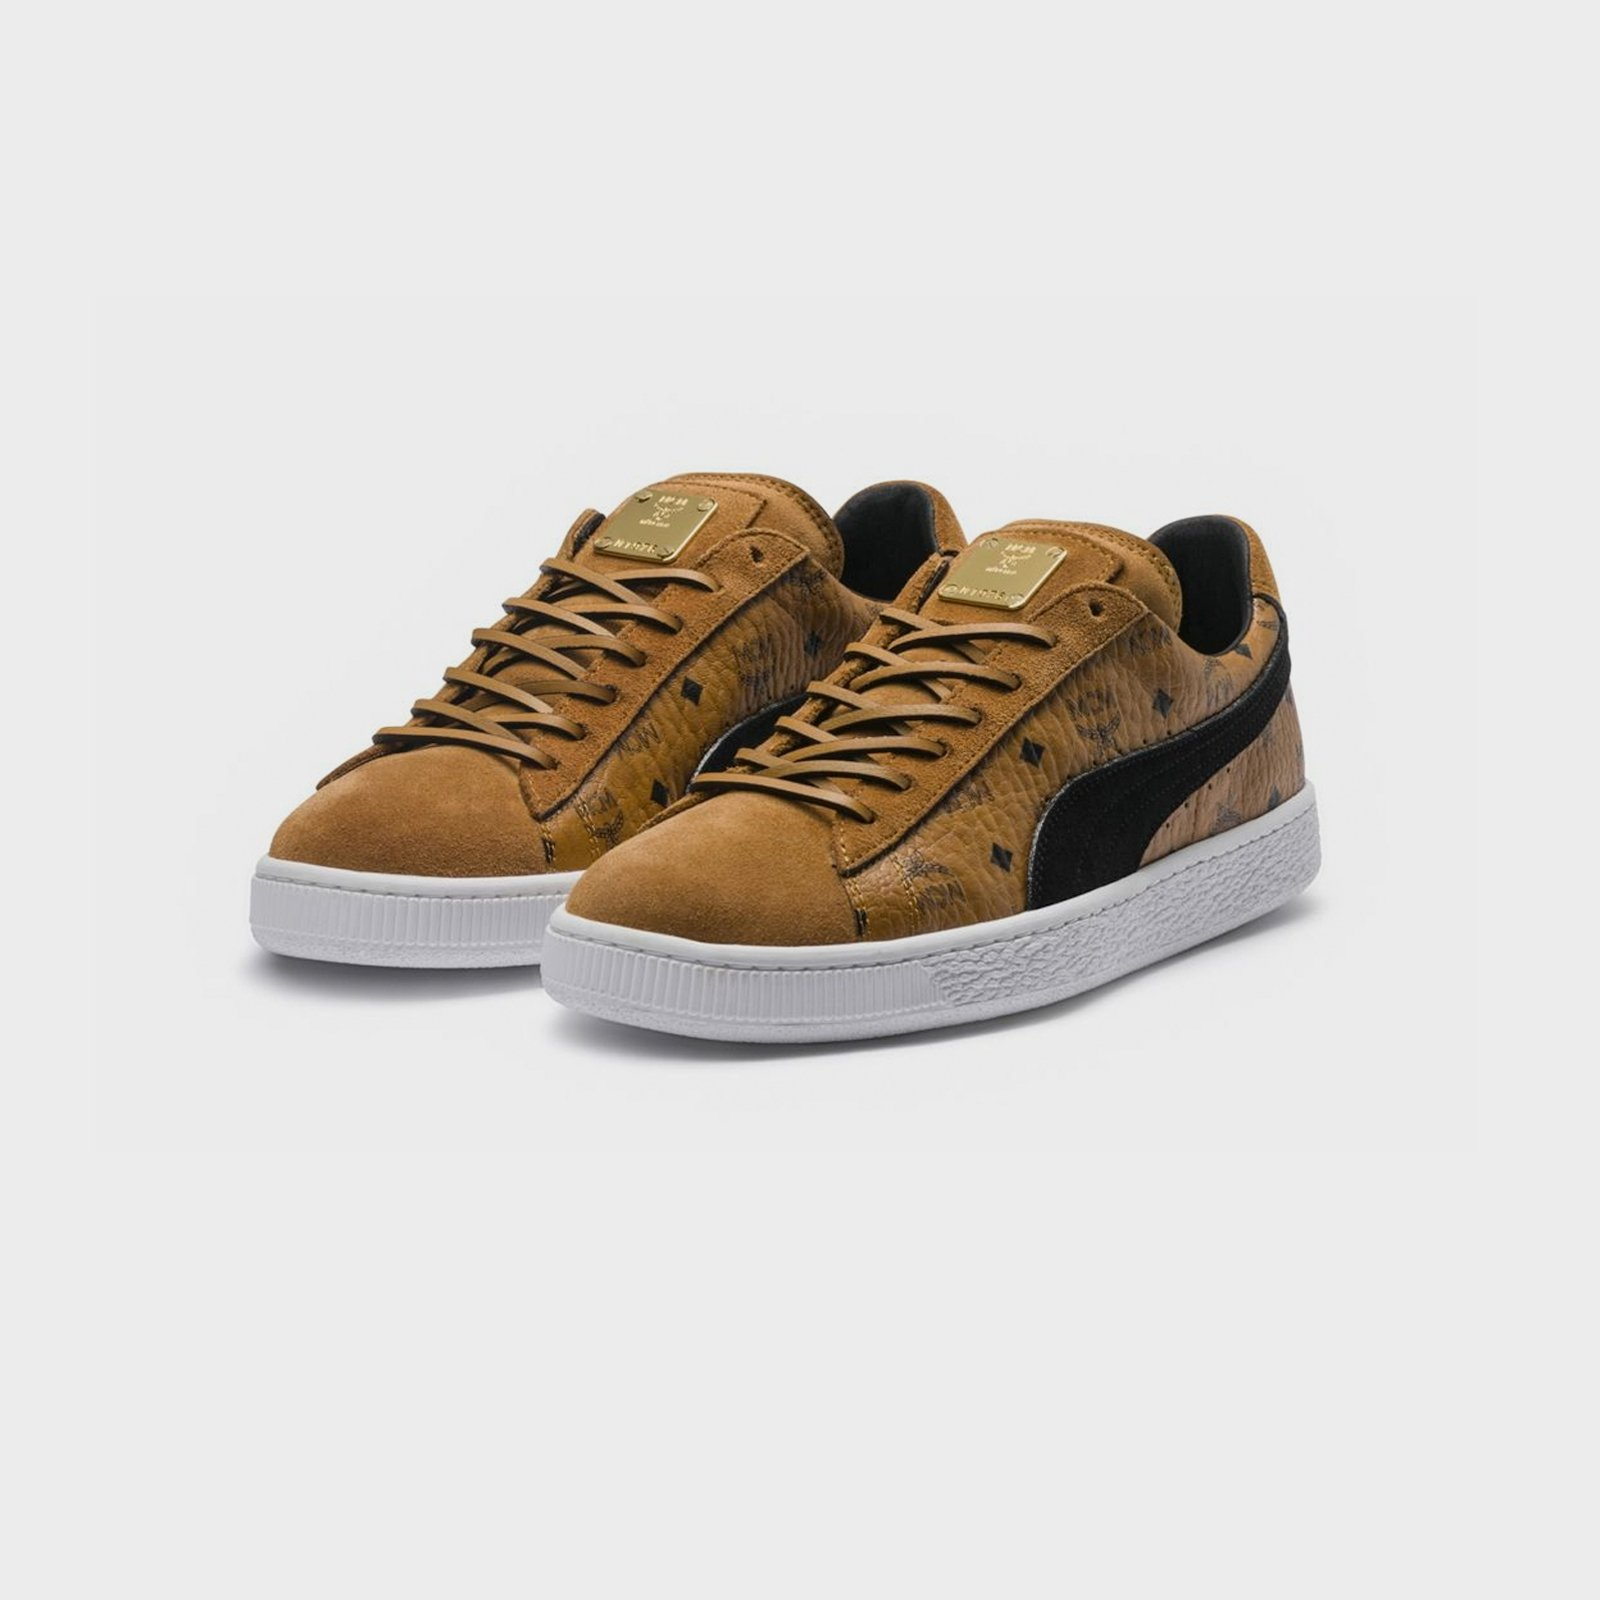 Puma Suede Classic x MCM 366299 01 Sneakersnstuff I